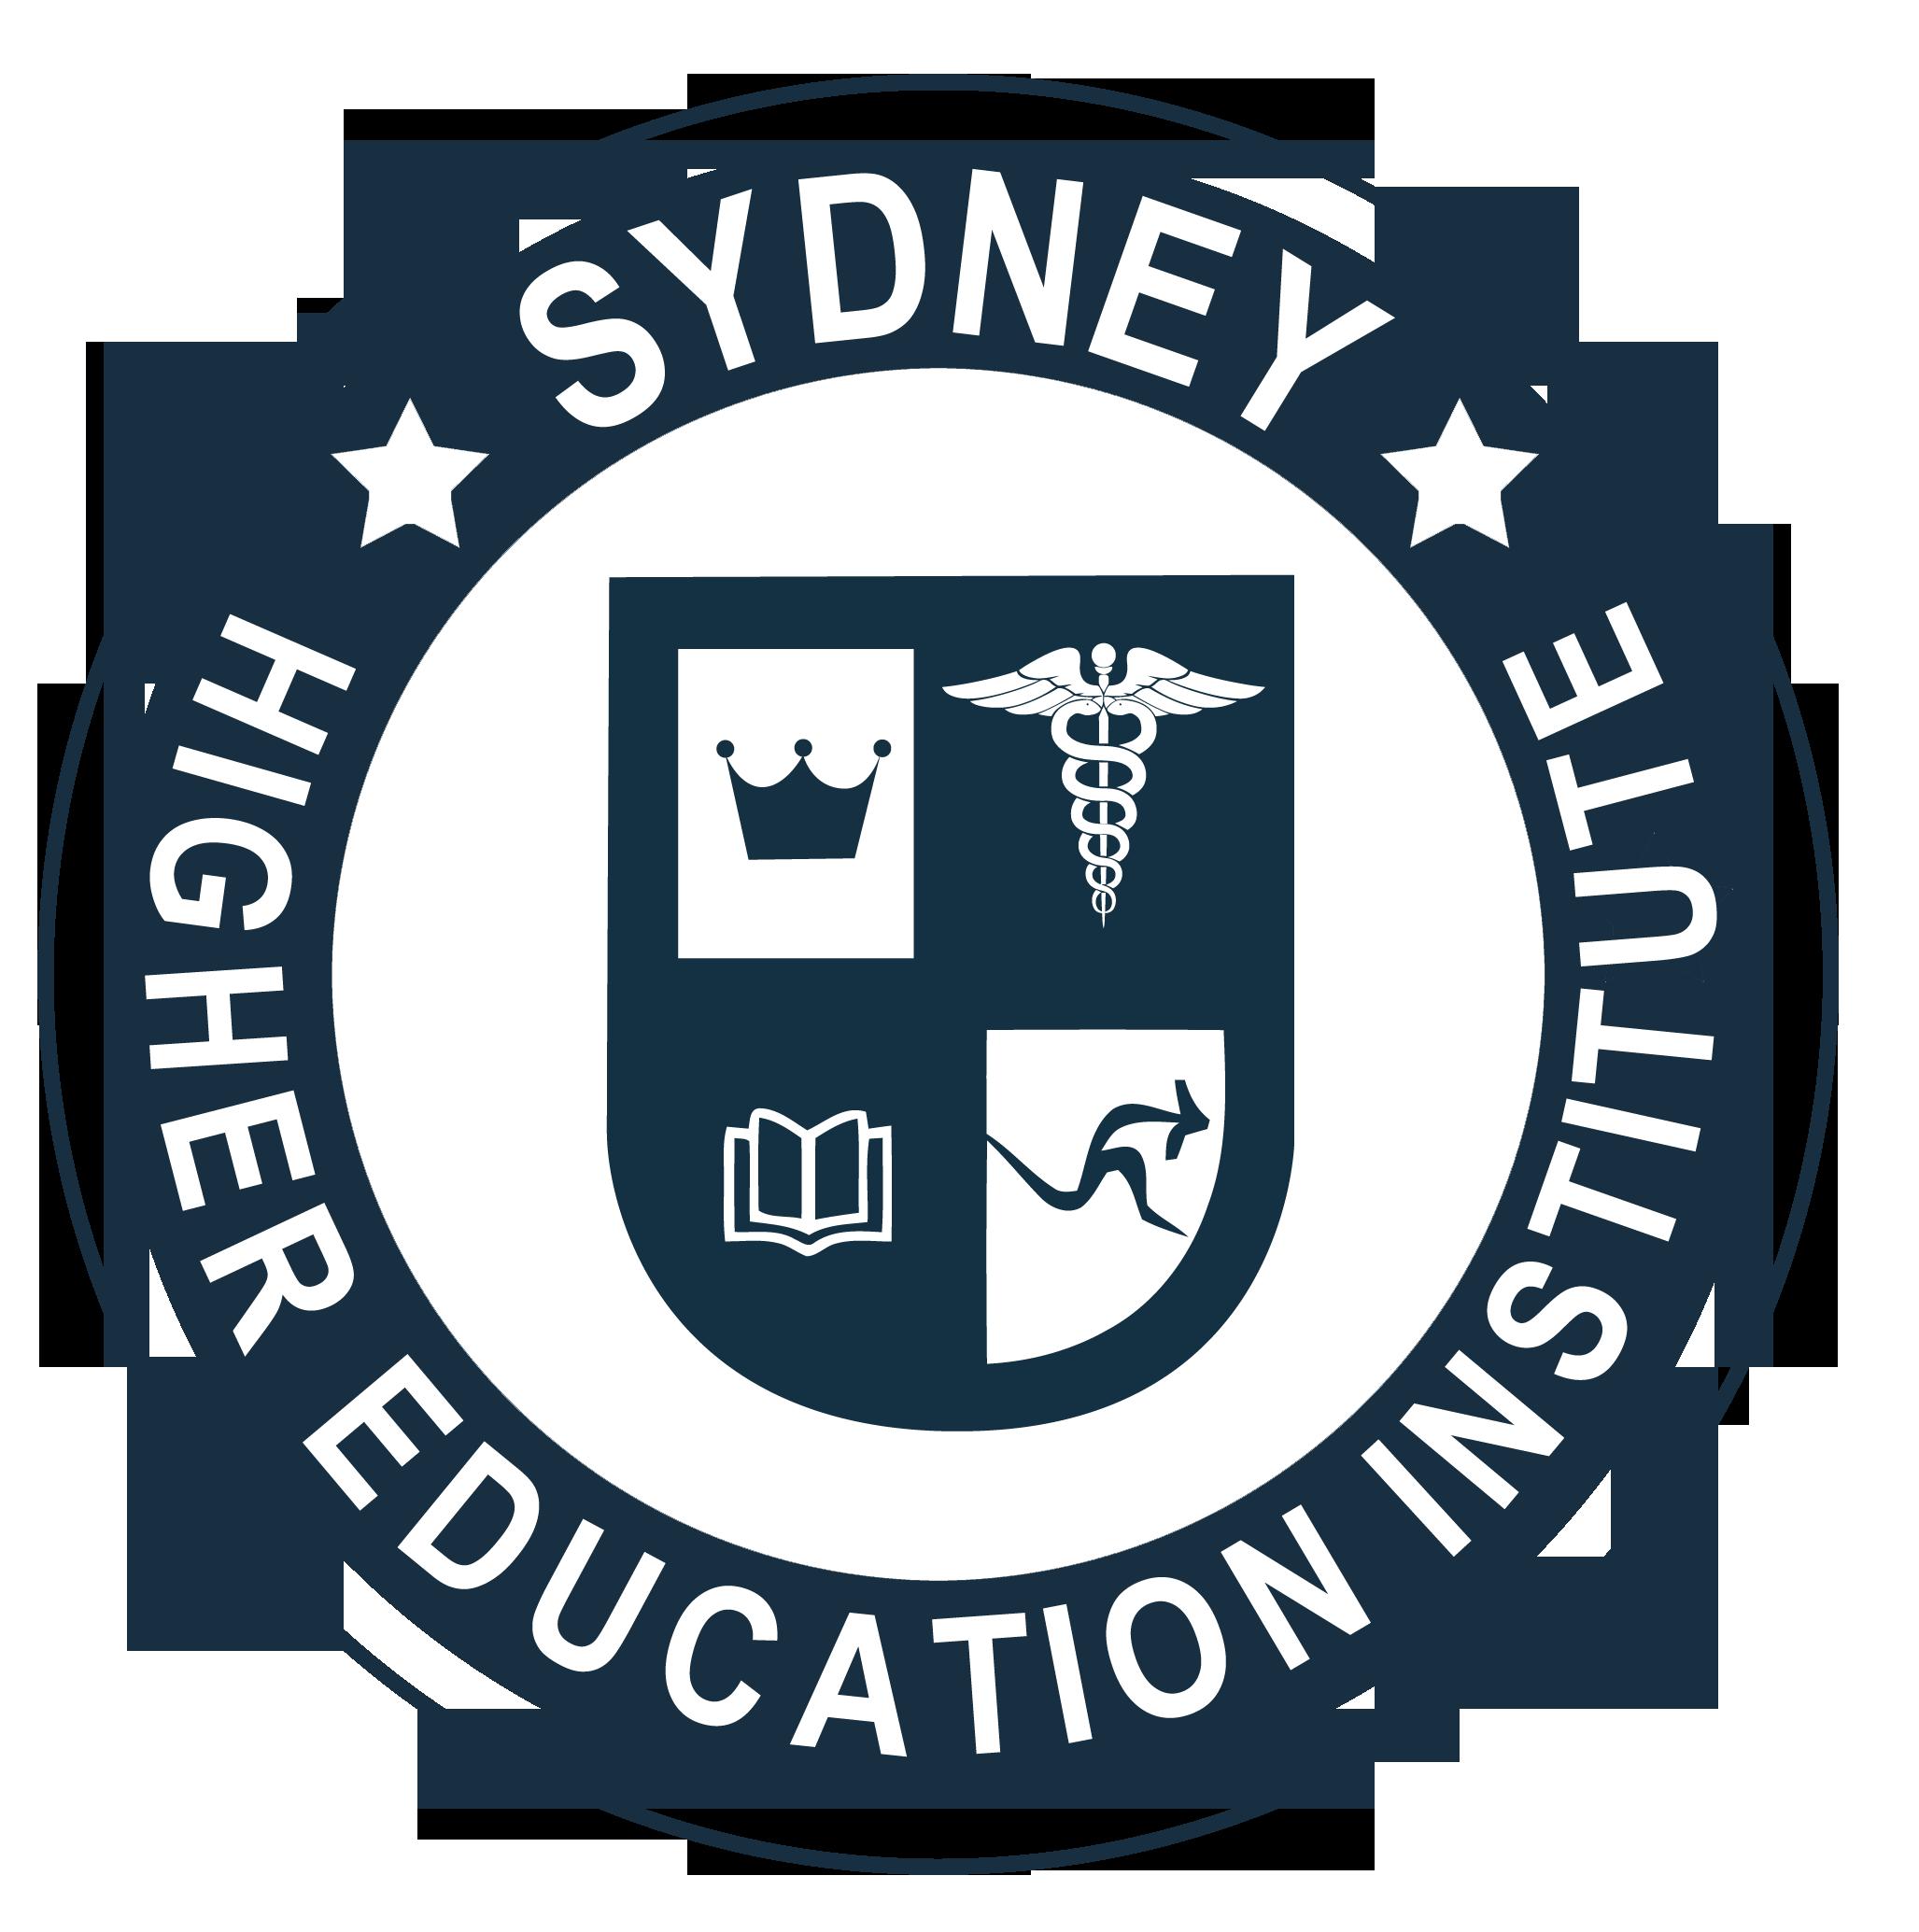 Certificate IV in TESOL - Sydney Higher Education Institute